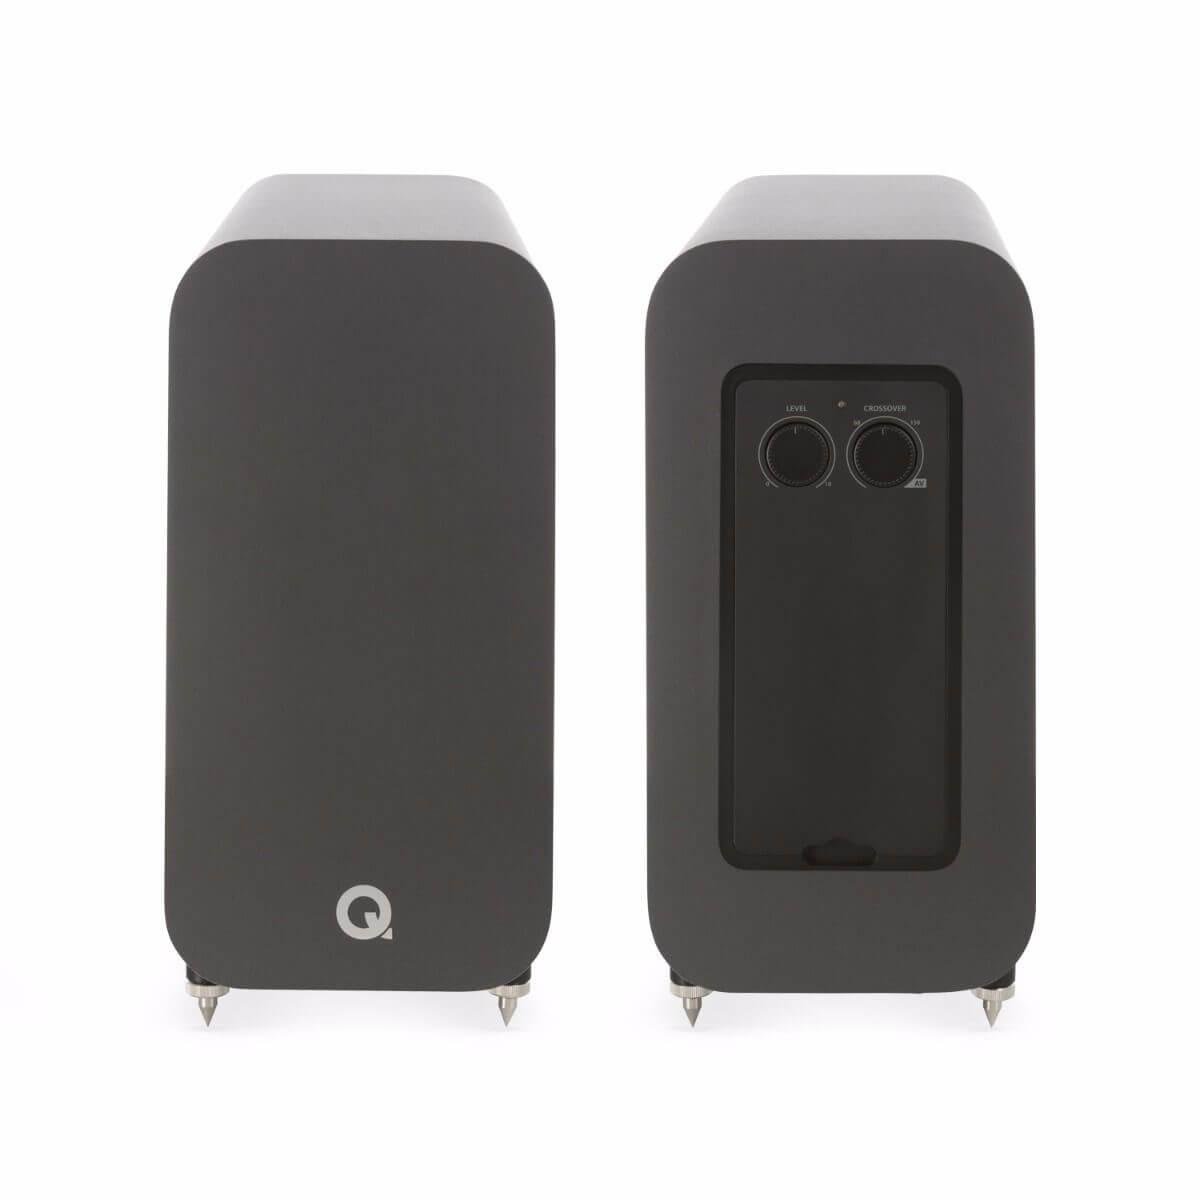 qacoustics bass speaker